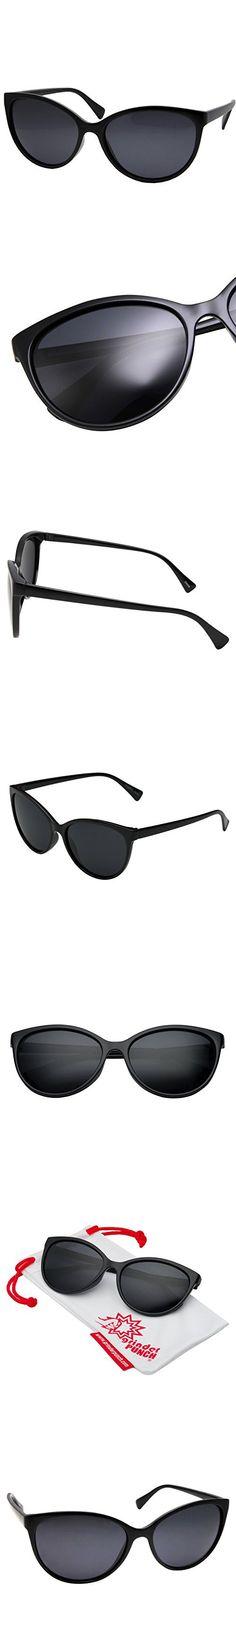 GrinderPUNCH Women's Polarized Cateye Sunglasses Lentes Black